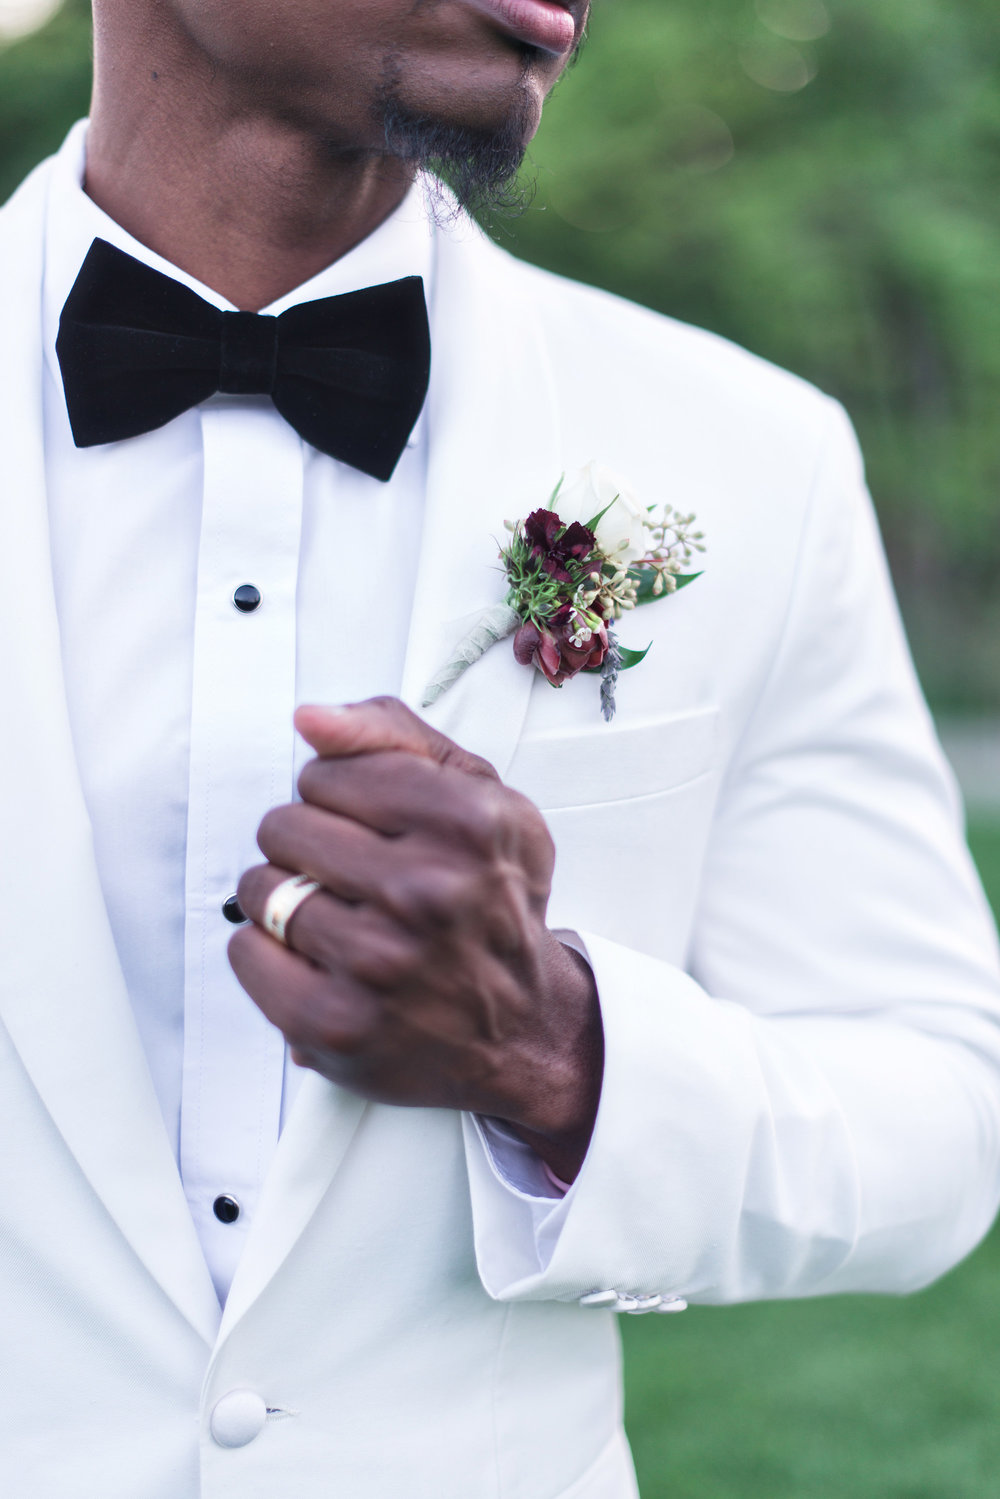 glamorous-jewel-tones-christmas-house-wedding-carrie-vines-021.jpg